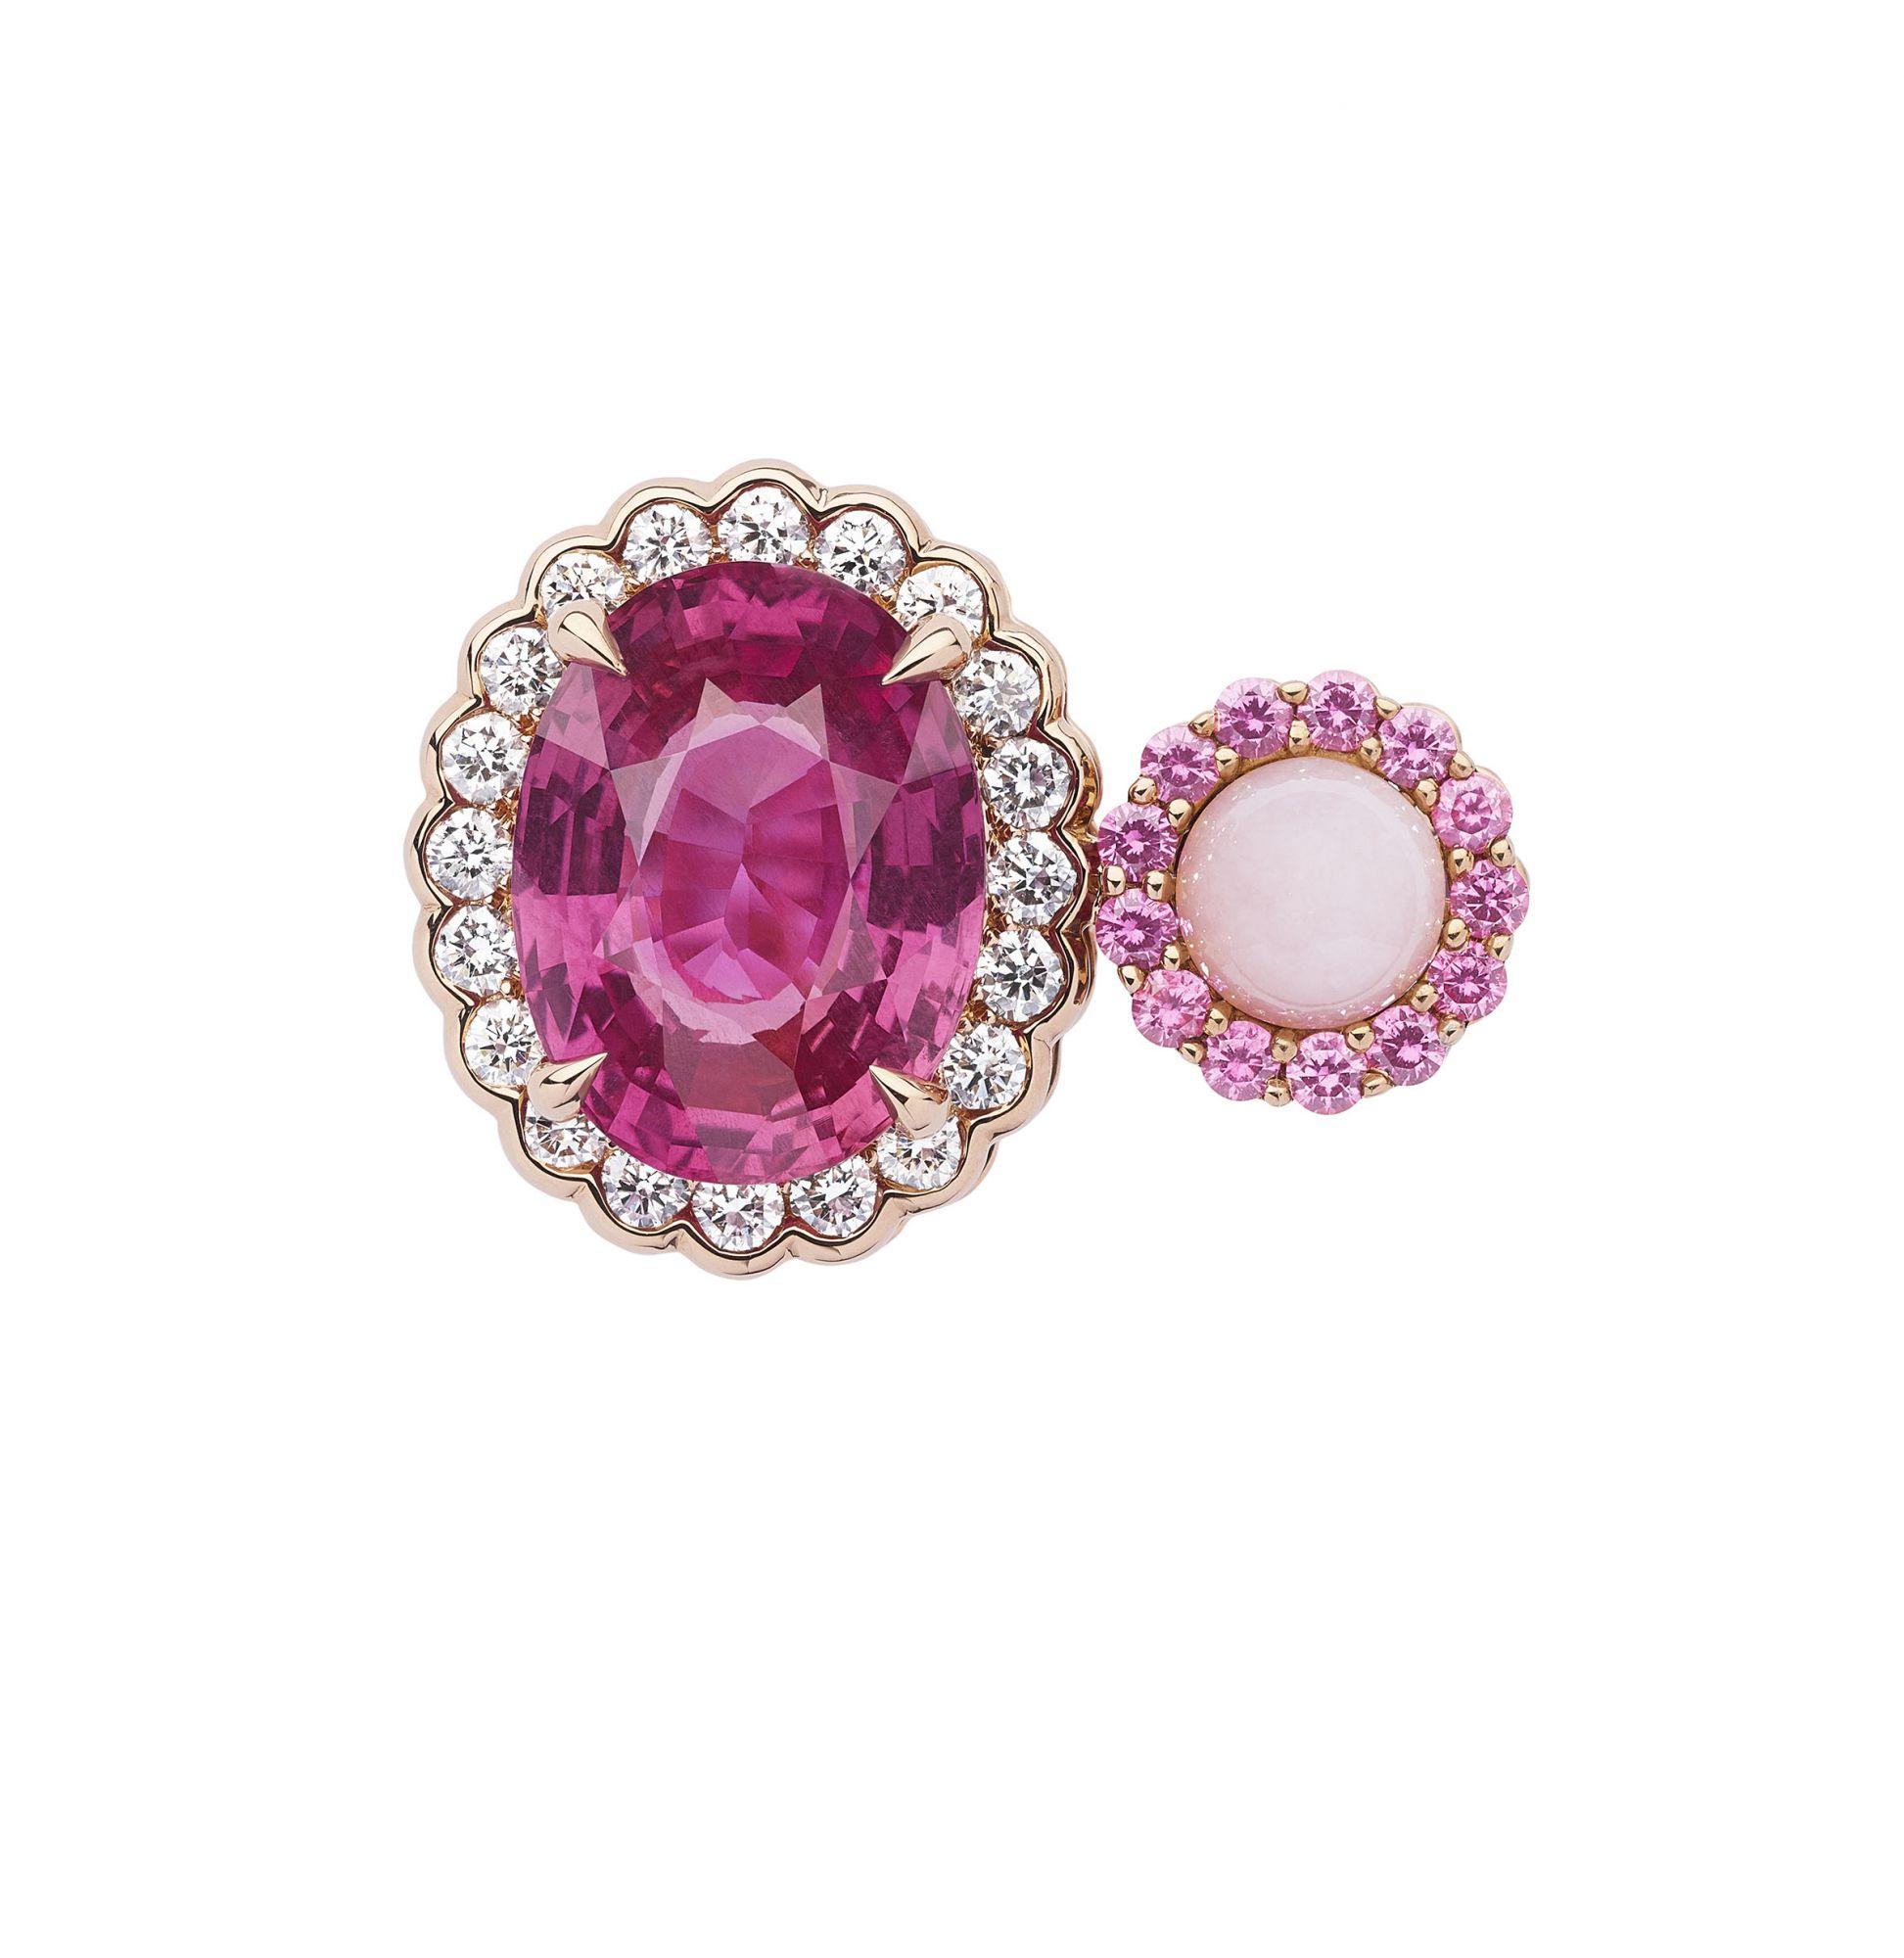 Dior et Moi 粉紅藍寶石與蛋白石戒指 by Dior Joaillerie。